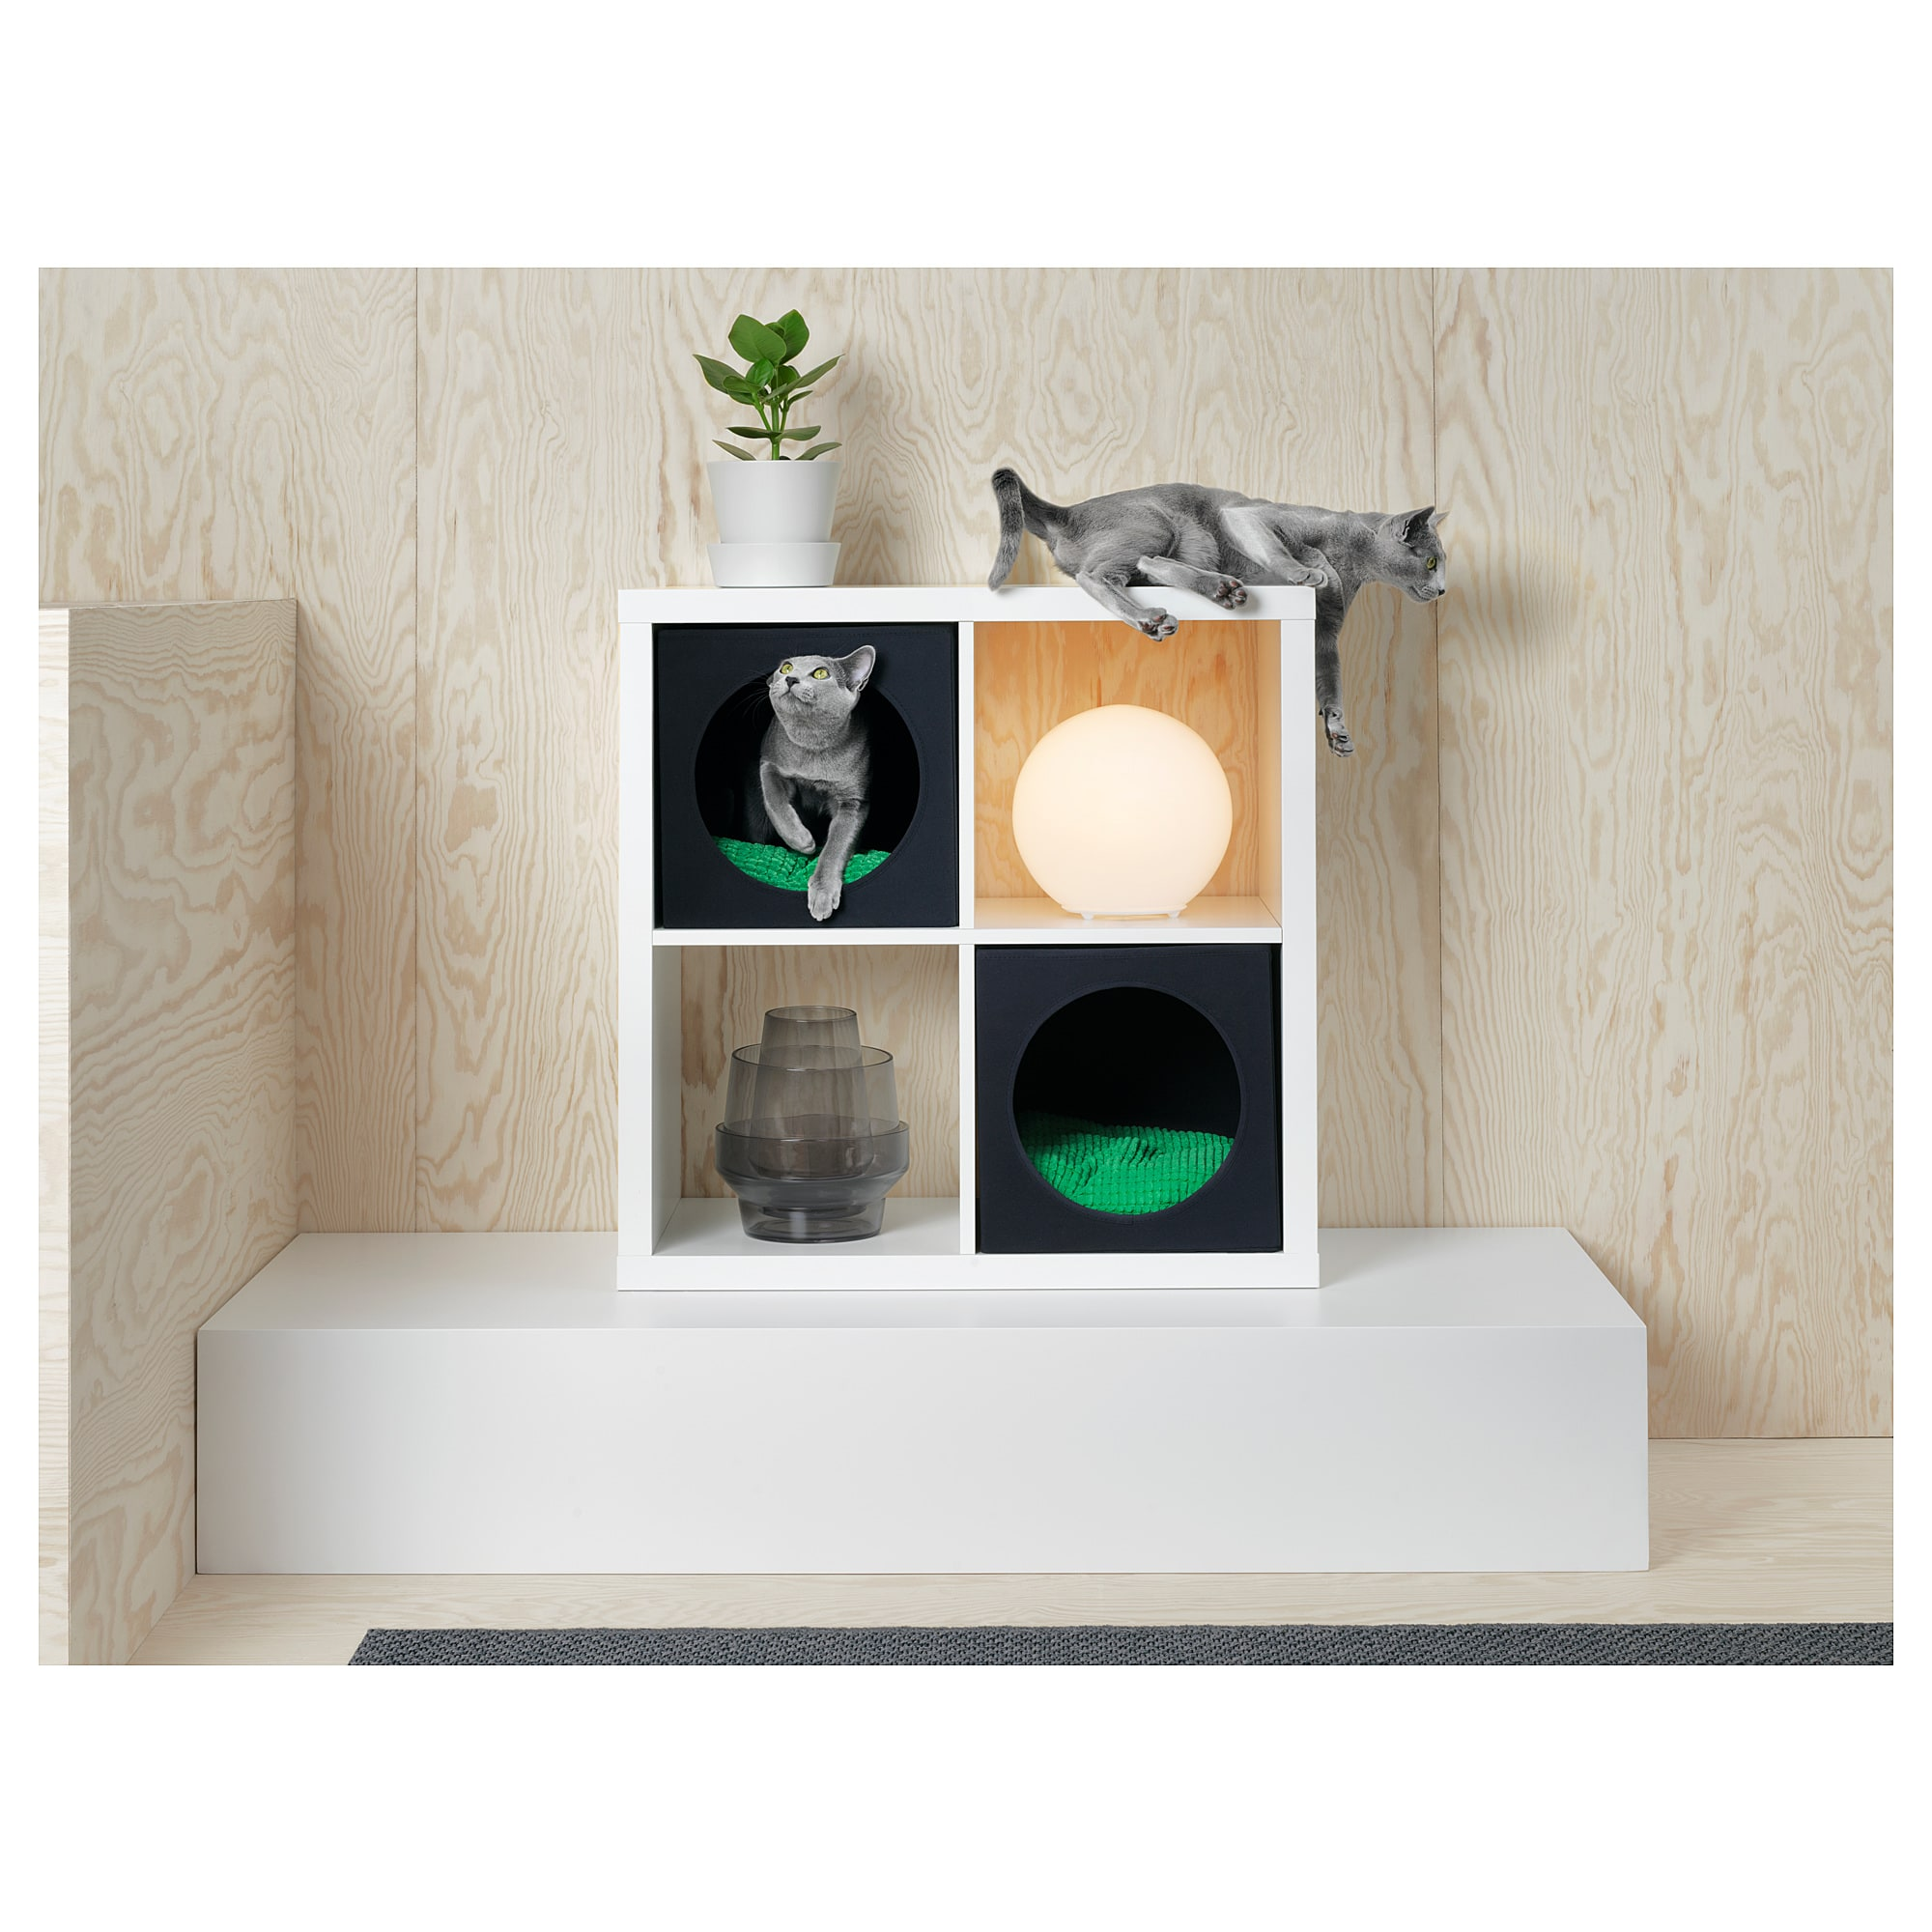 lurvig-cat-house-black__0631340_PH147900_S5.JPG